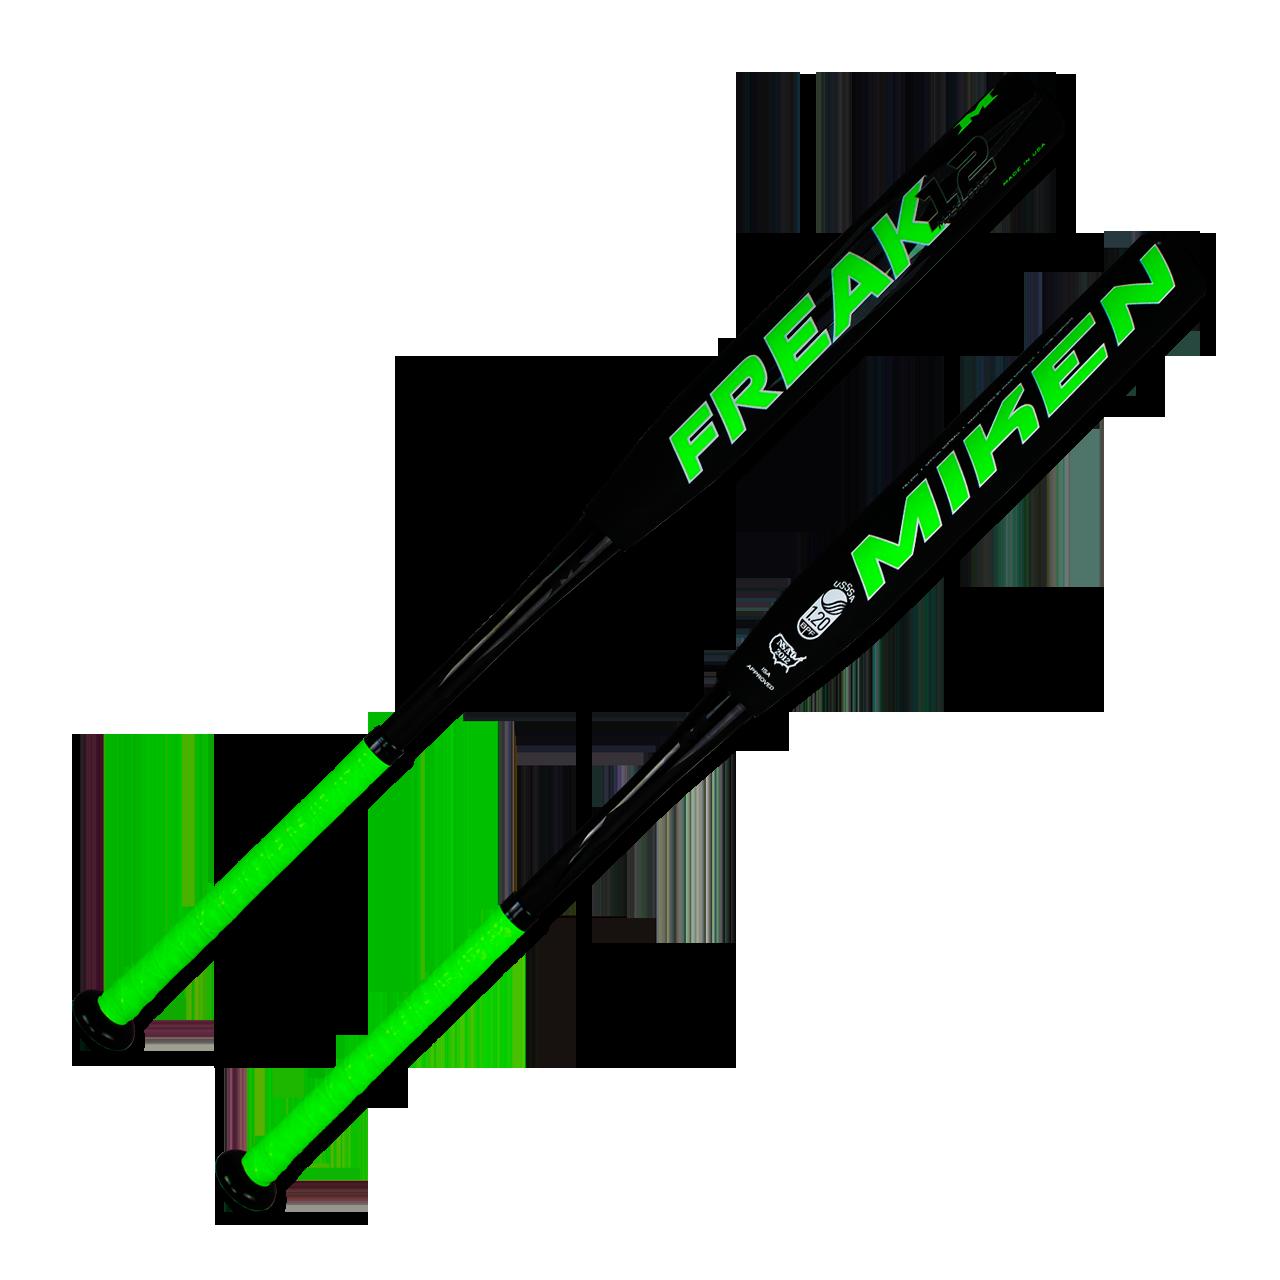 miken-freak-maxload-12-slow-pitch-softball-bat-34-inch-28-oz-fp12mu FB12MU-3-34-inch-28-oz Miken 658925031892 Triple Matrix increases the exclusive aerospace grade material volume by 5%